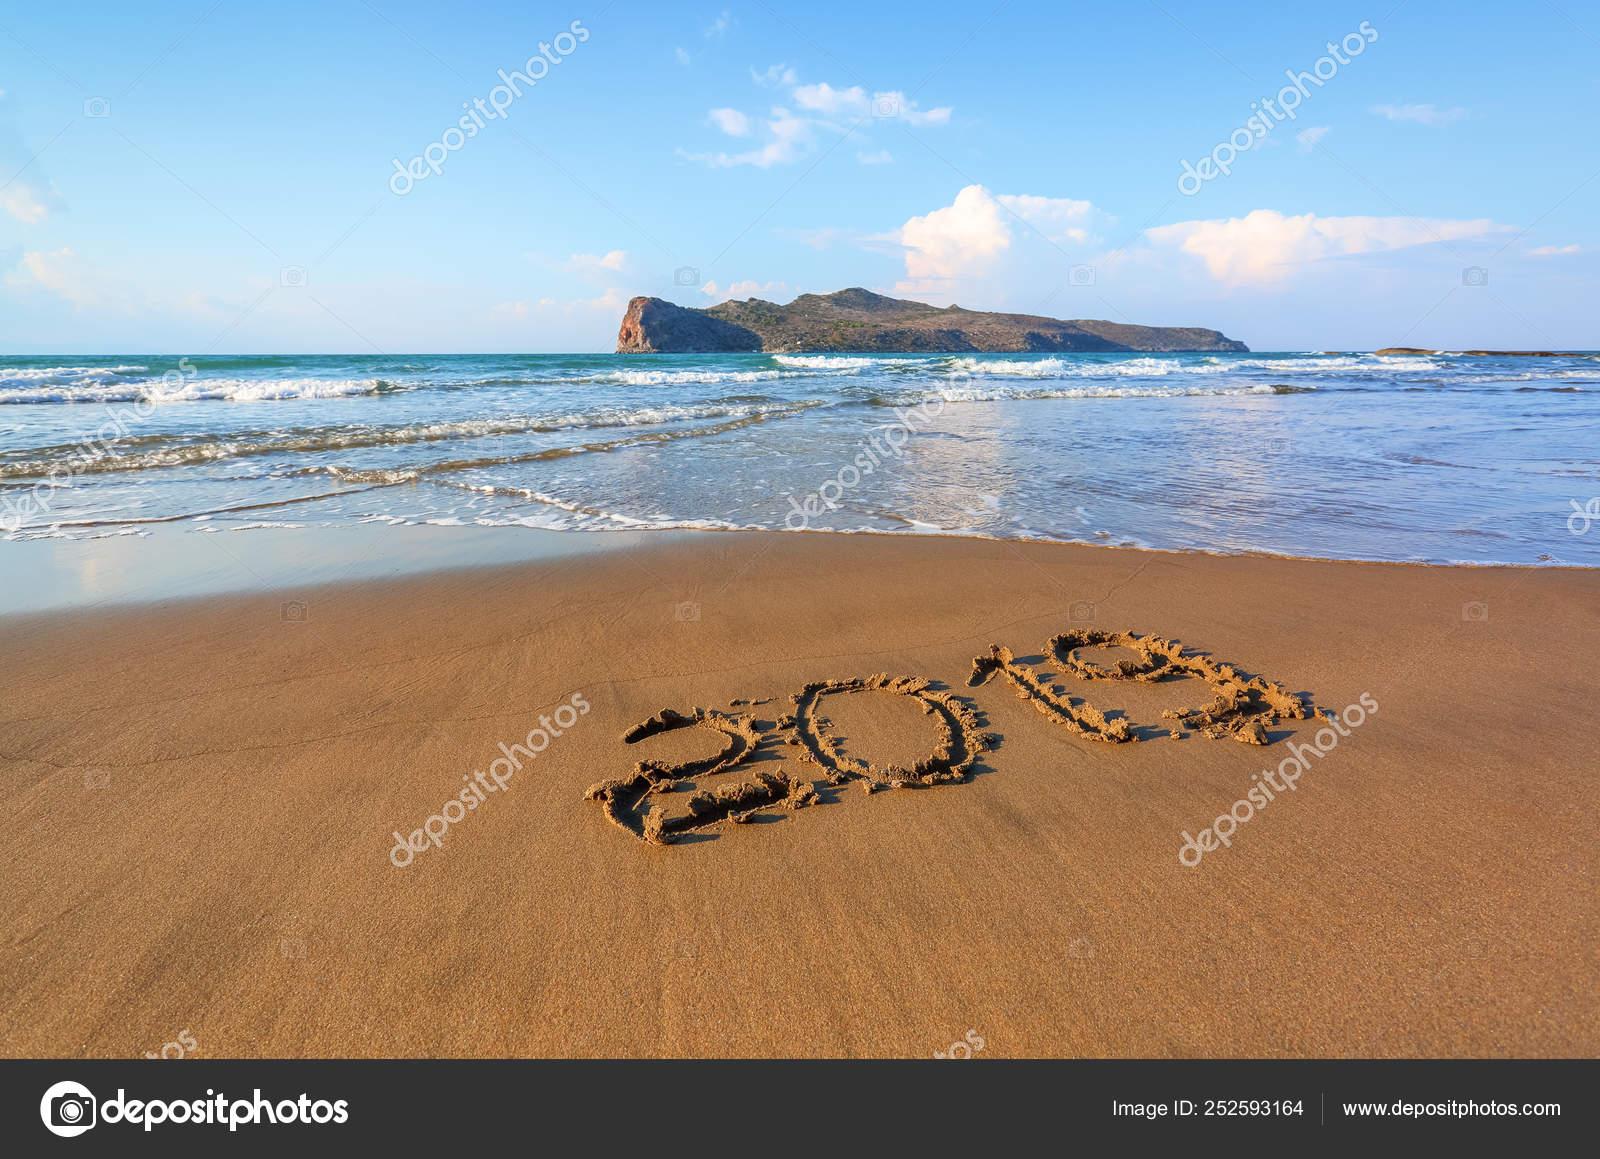 Famous Resort Of Crete Island Greece Sand Beach Seascape